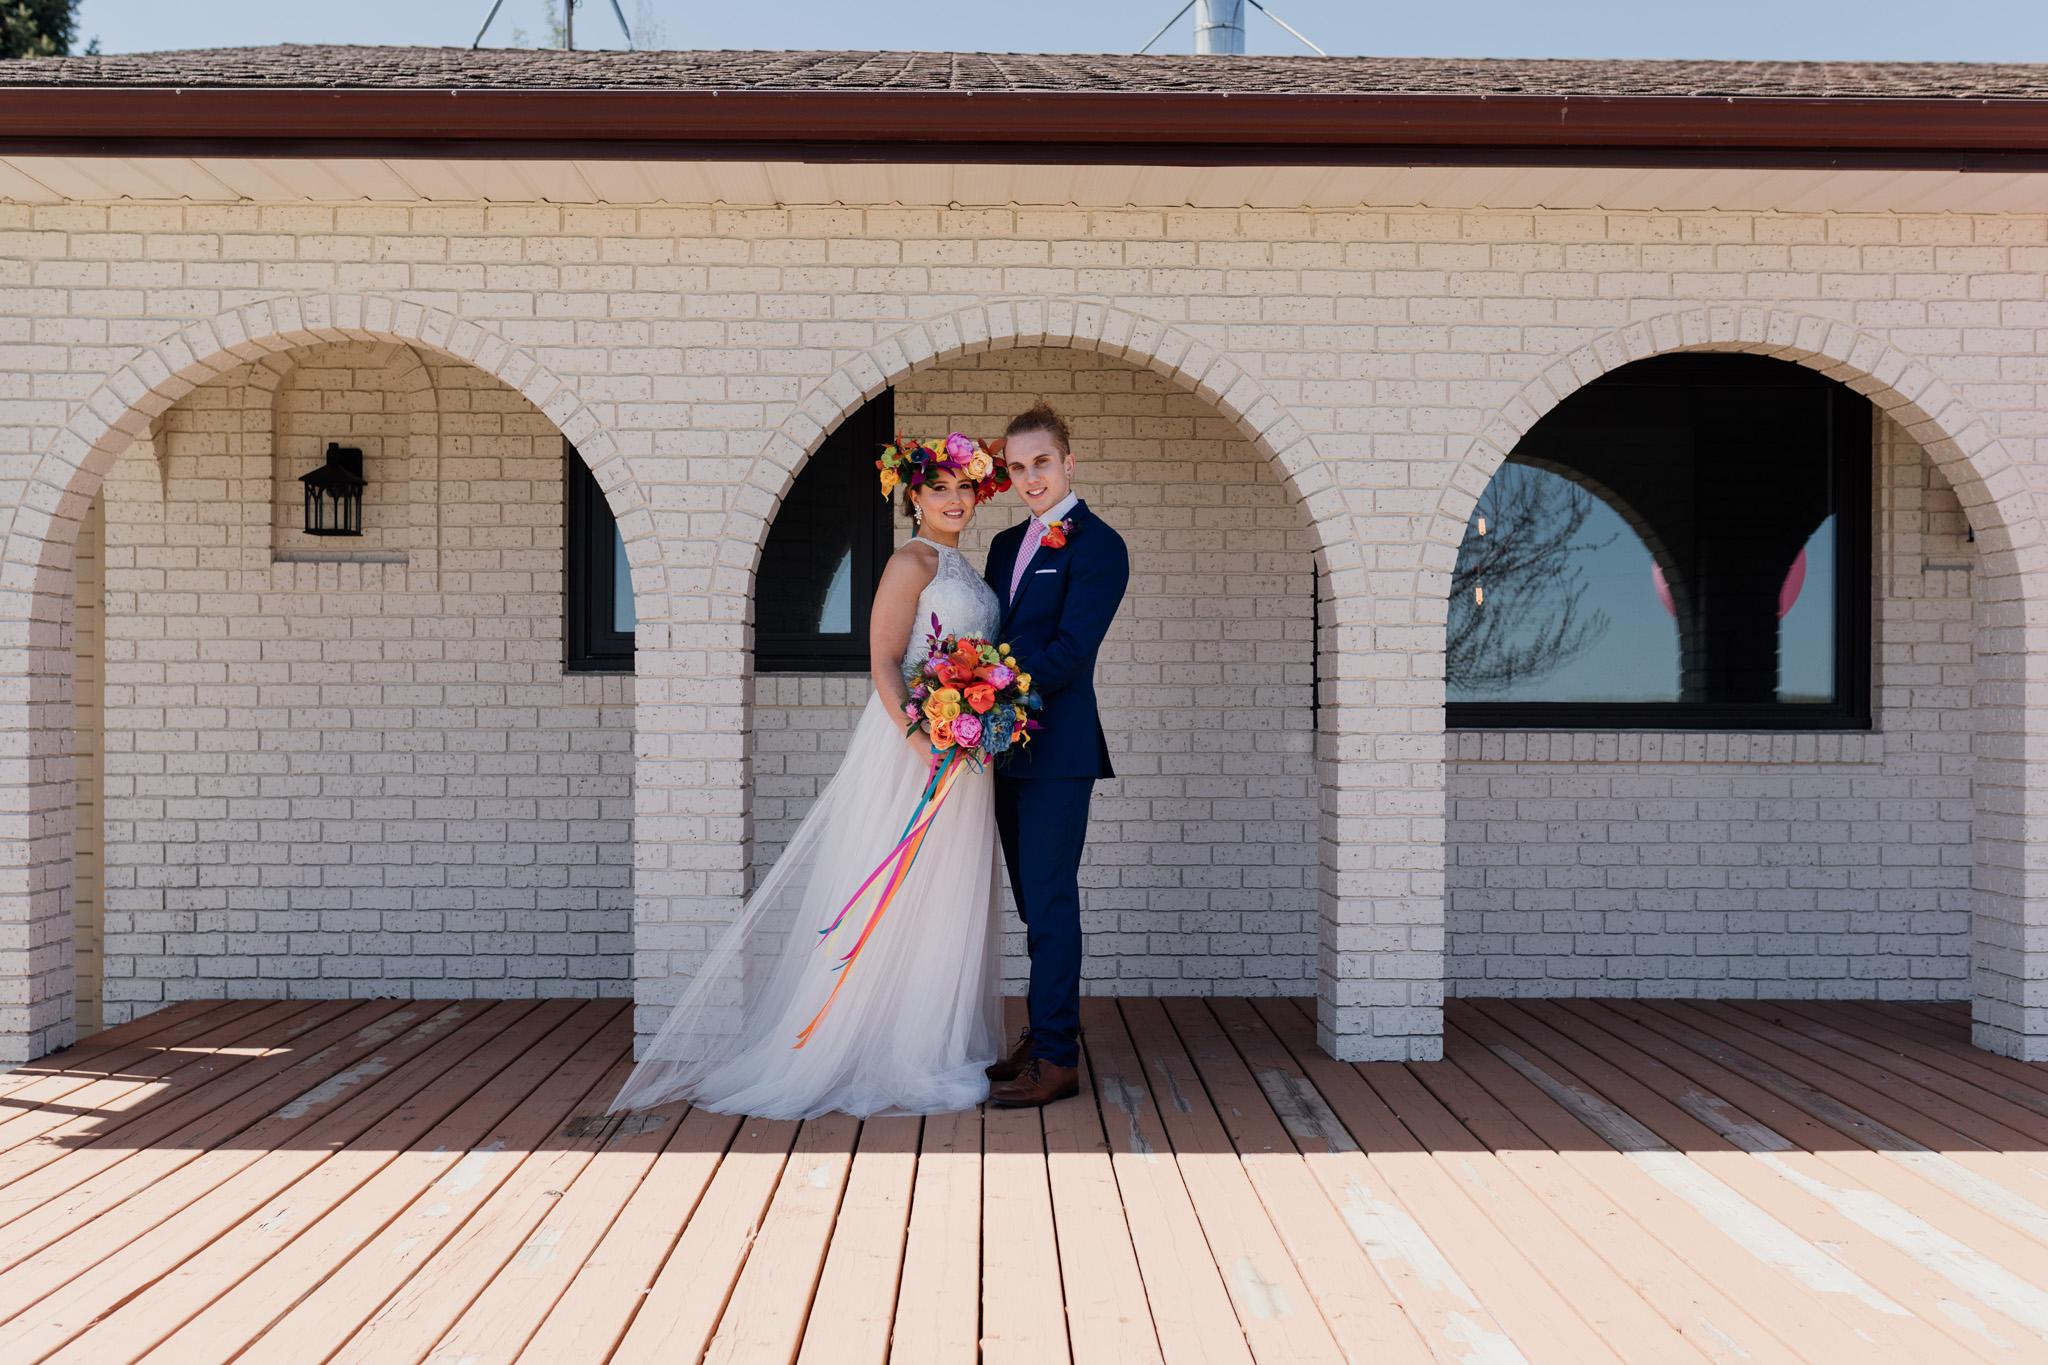 winnipeg-wedding-starlit point-32.jpg